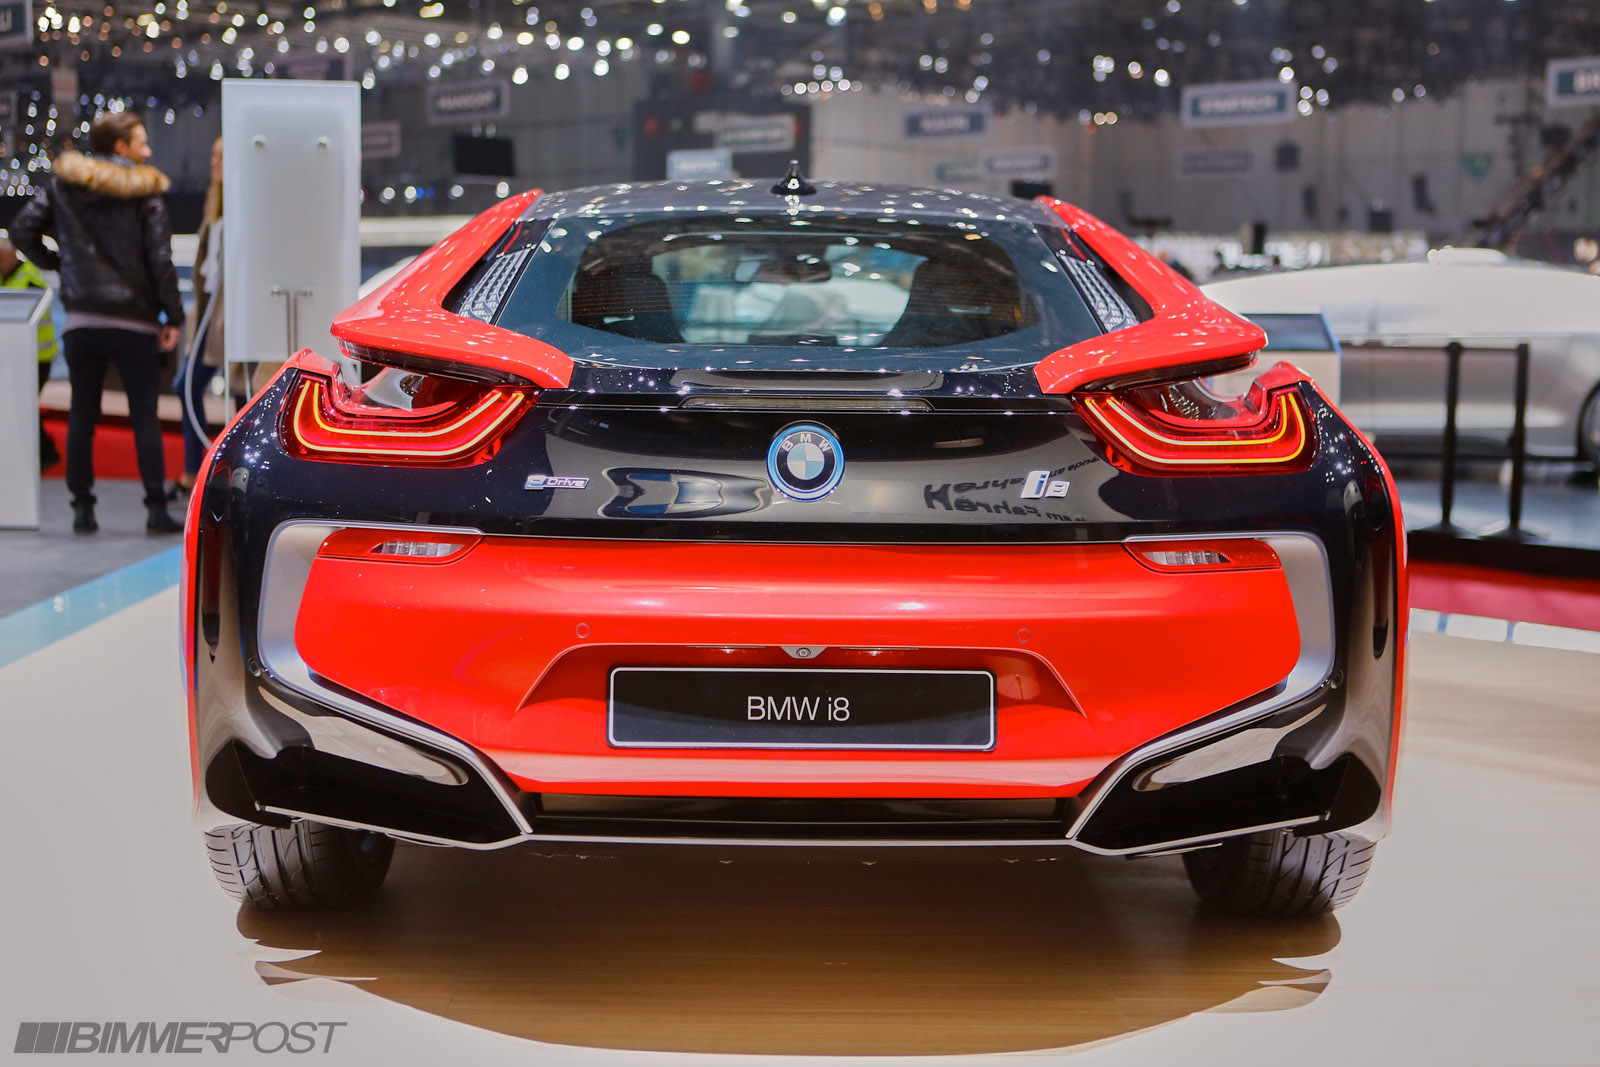 New Limited Edition Bmw I8 Protonic Red Edition W Geneva Auto Show